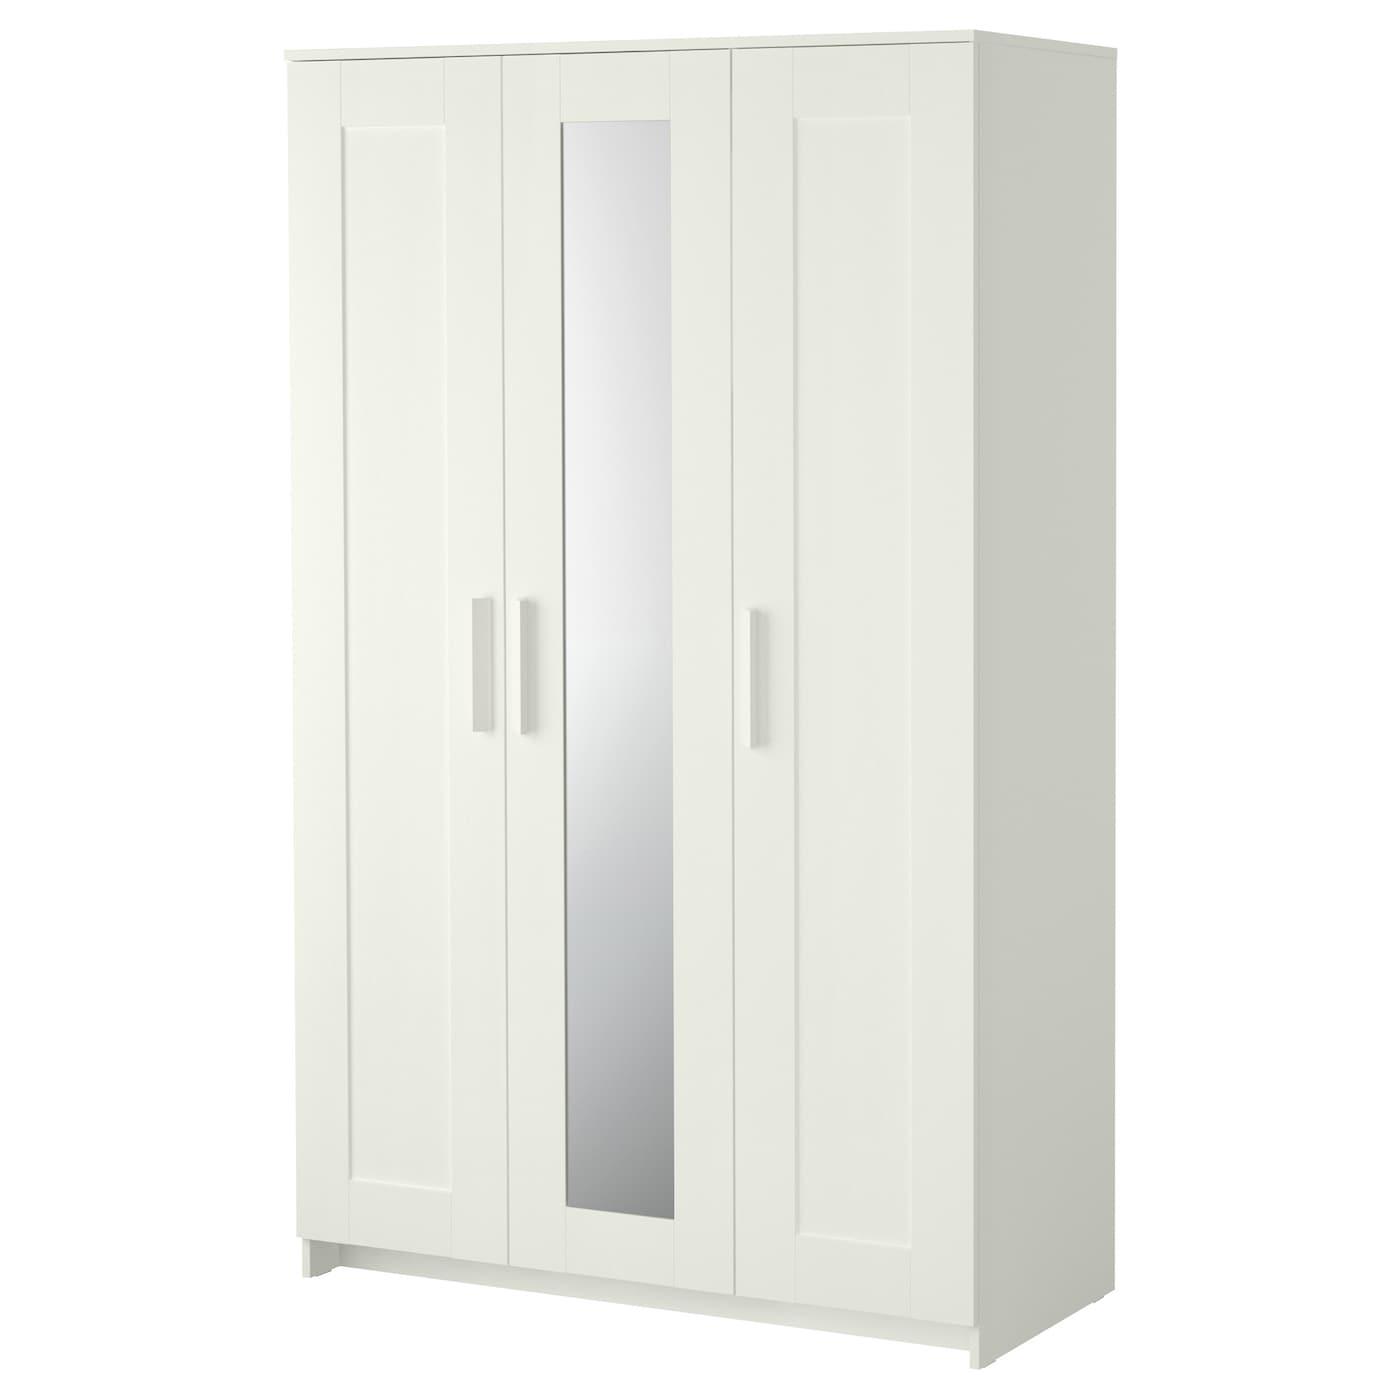 Kvikne wardrobe with 2 sliding doors white 120x190 cm ikea for Armoire ikea